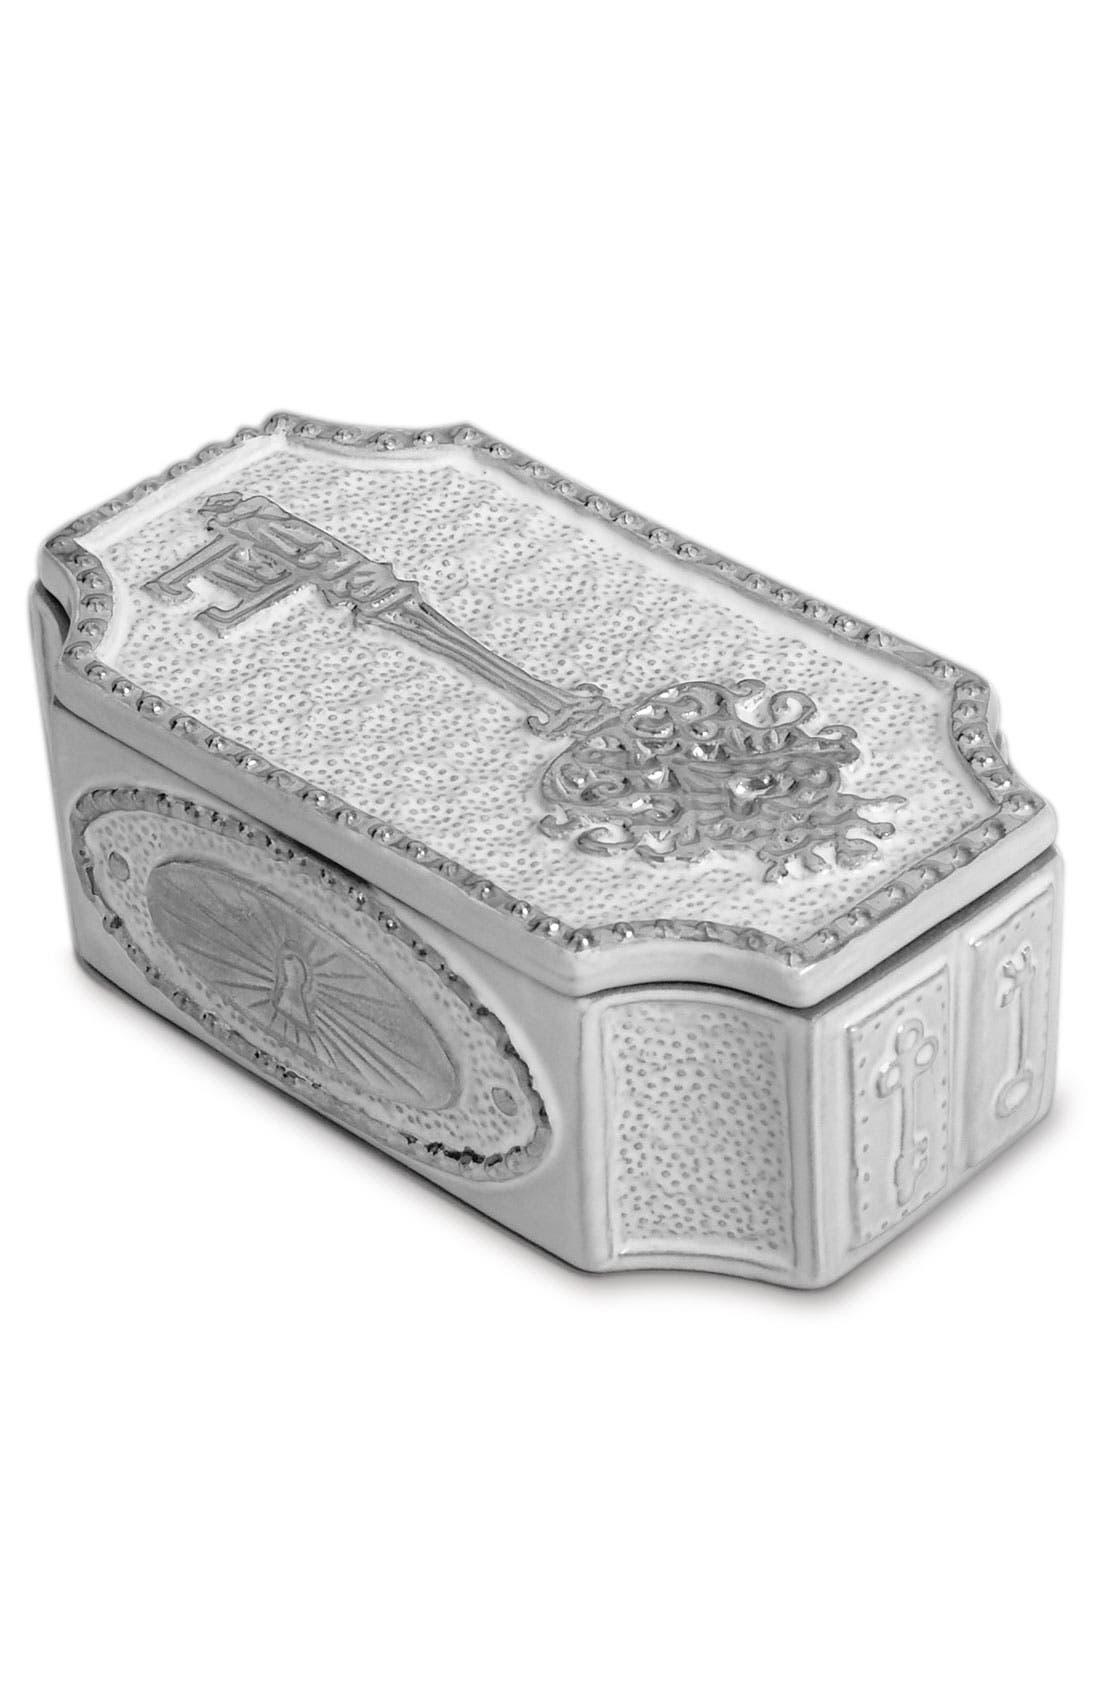 Main Image - Jonathan Adler Glazed Key Box